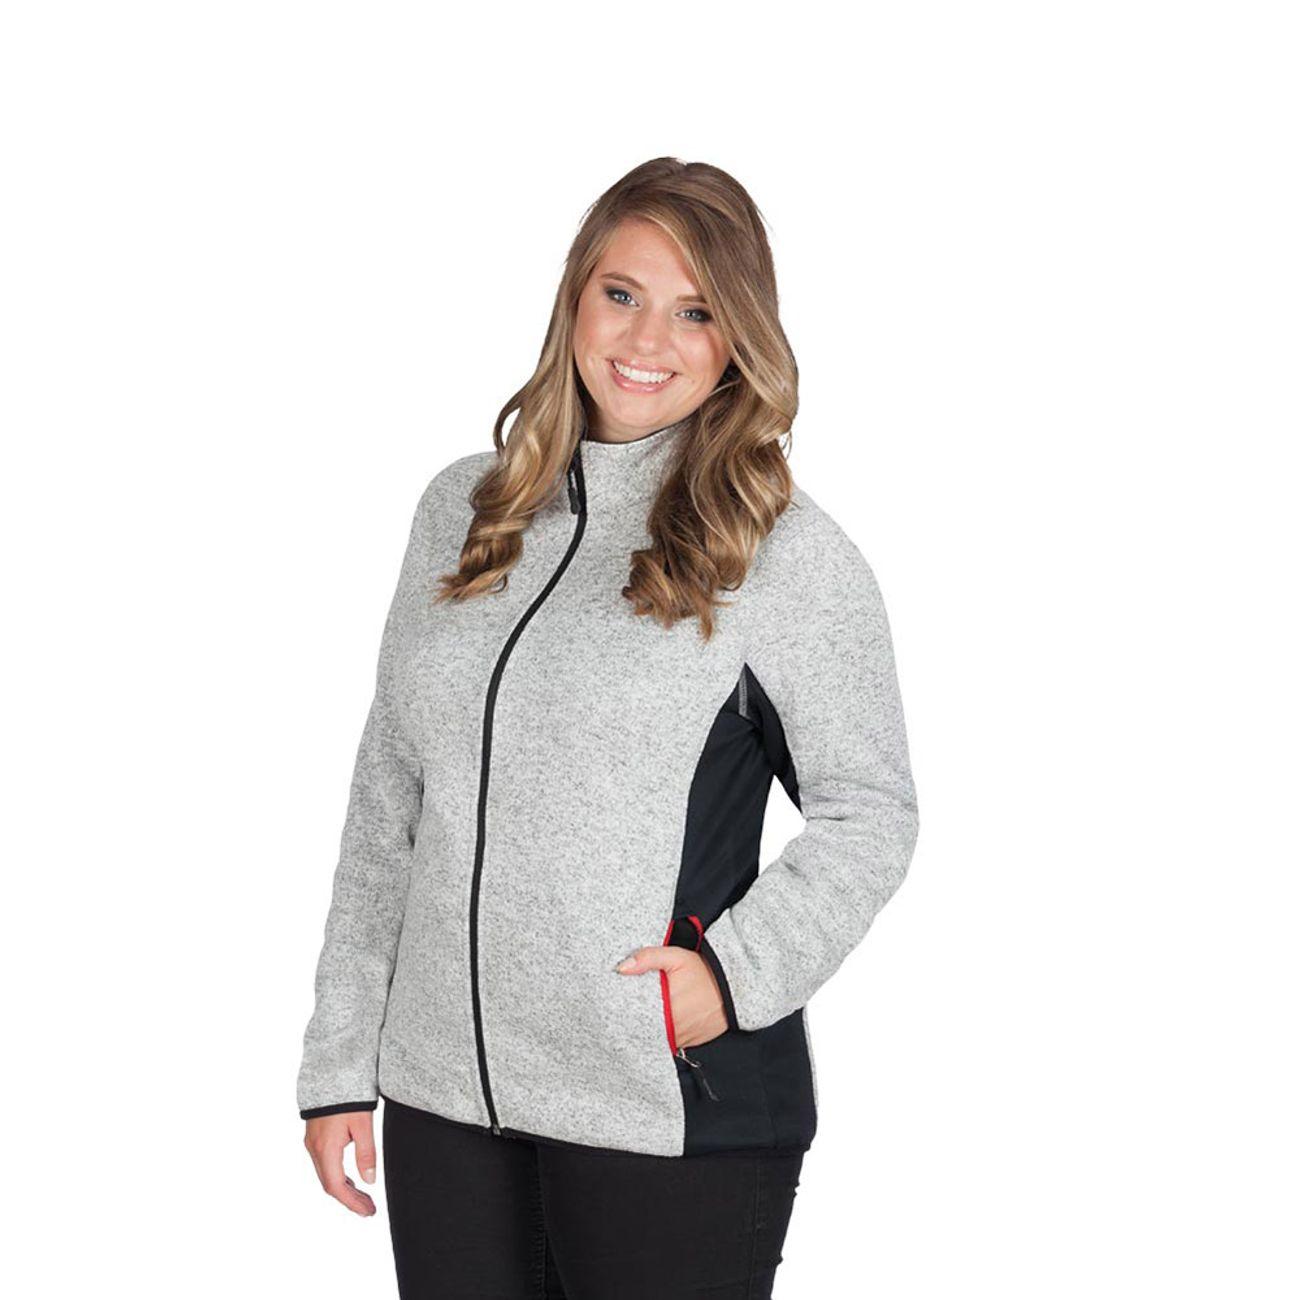 veste en laine femme grande taille achat et prix pas cher go sport. Black Bedroom Furniture Sets. Home Design Ideas